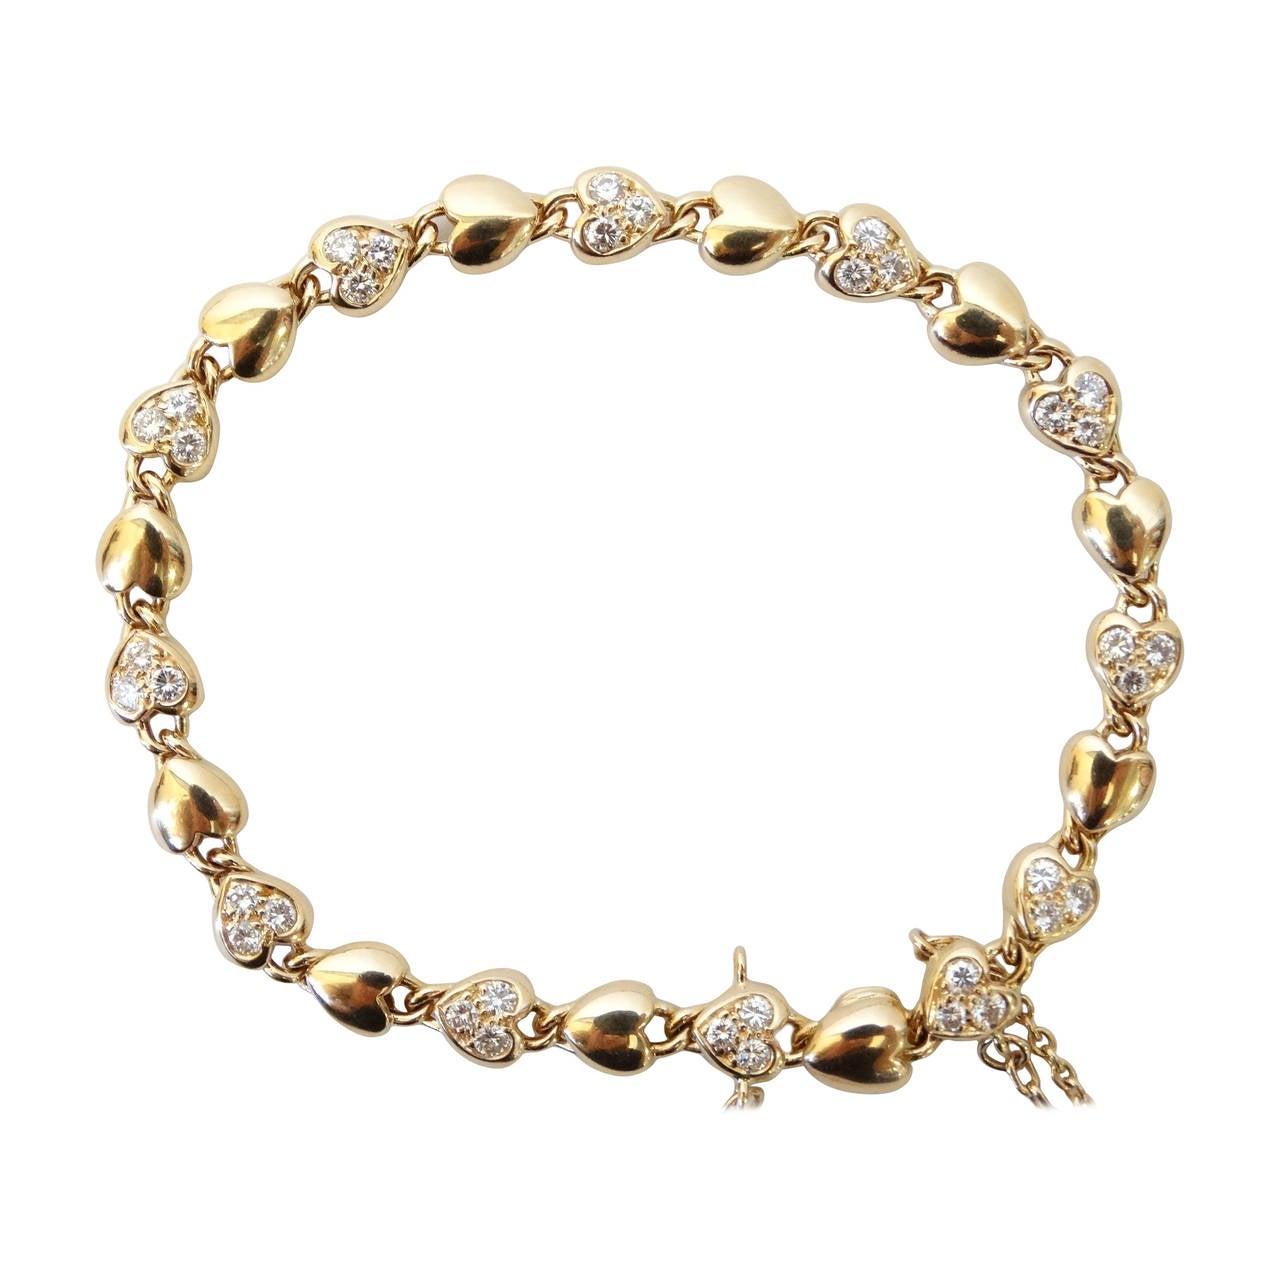 CARTIER 18k Yellow Gold Heart Link Bracelet with Diamonds at 1stdibs